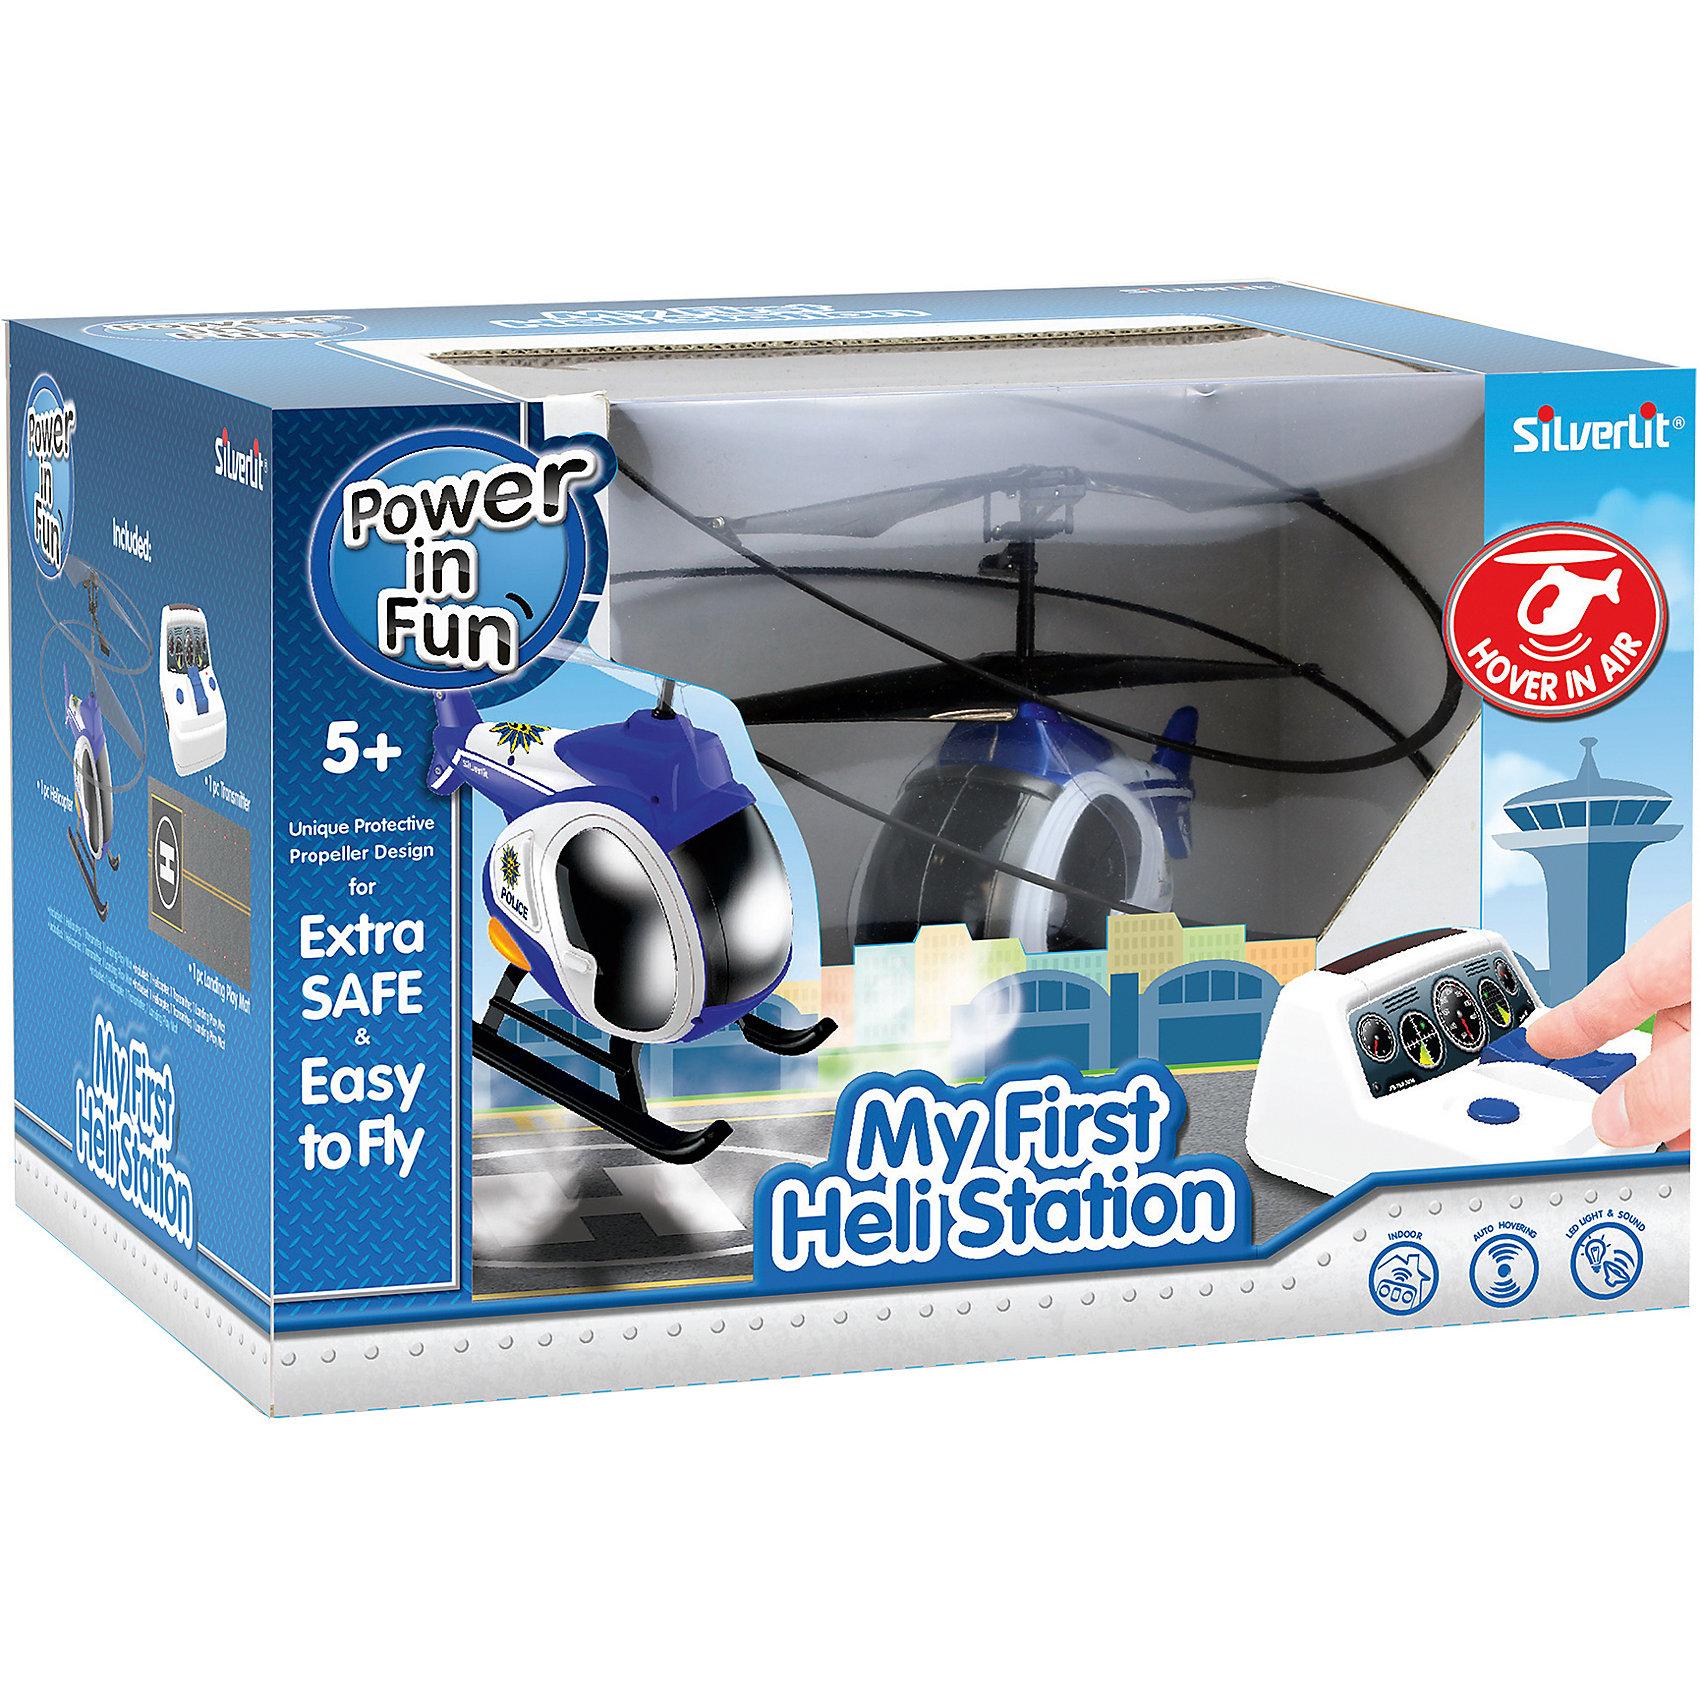 Моя первая вертолетная станция, Silverlit от myToys